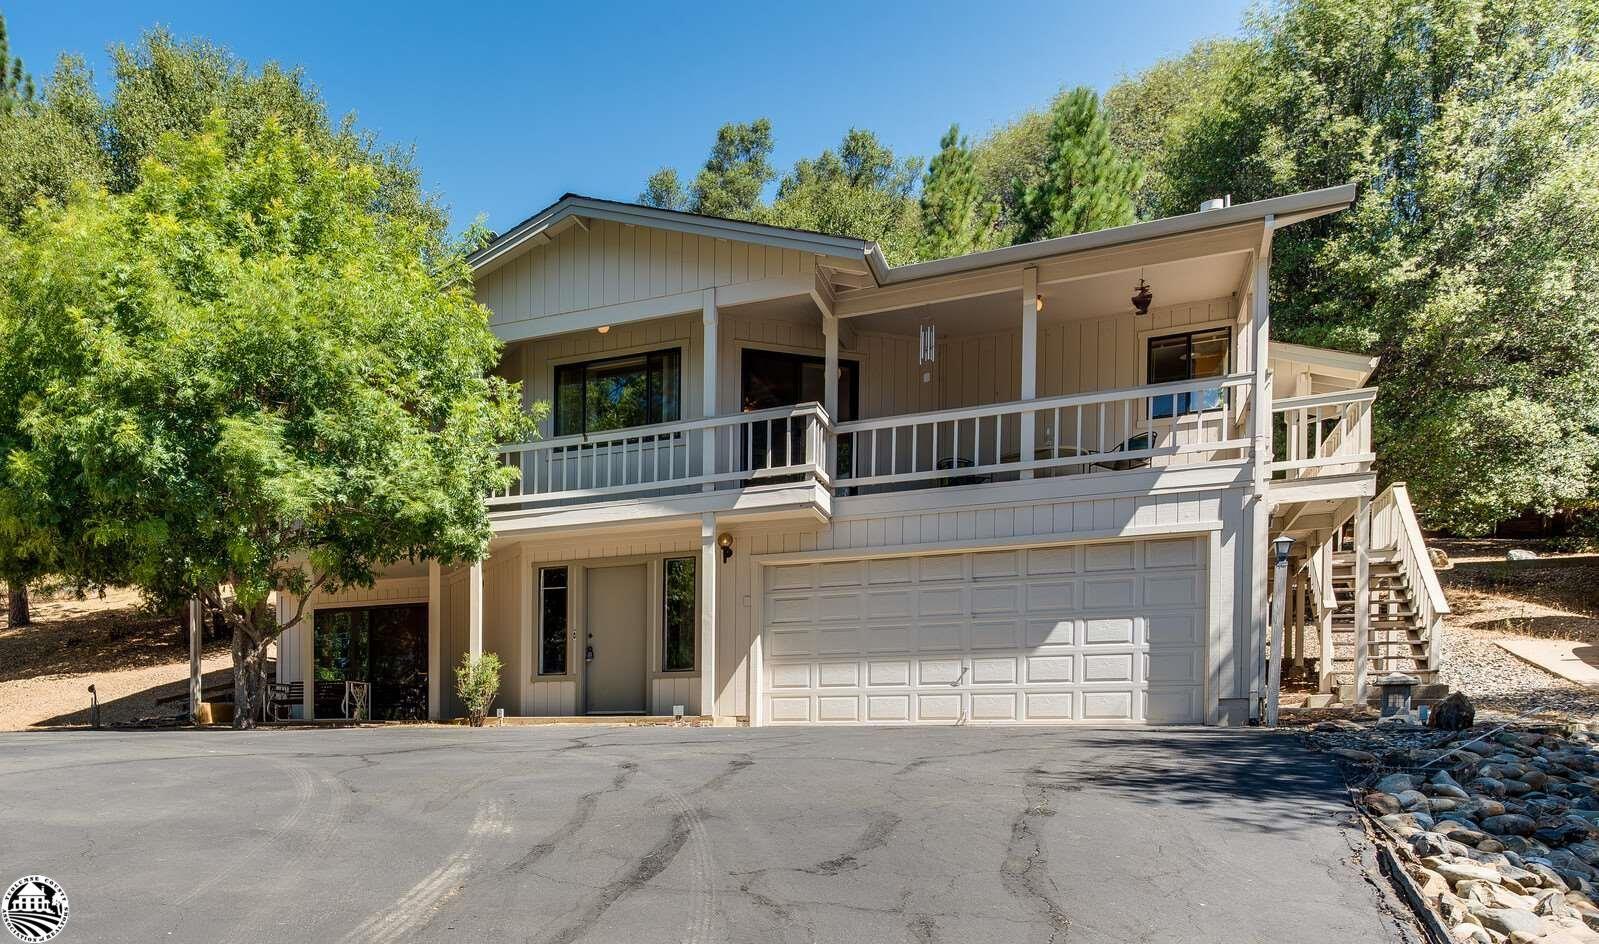 19865 Pleasant View Drive Drive, Groveland, CA 95321 - MLS#: 20201220